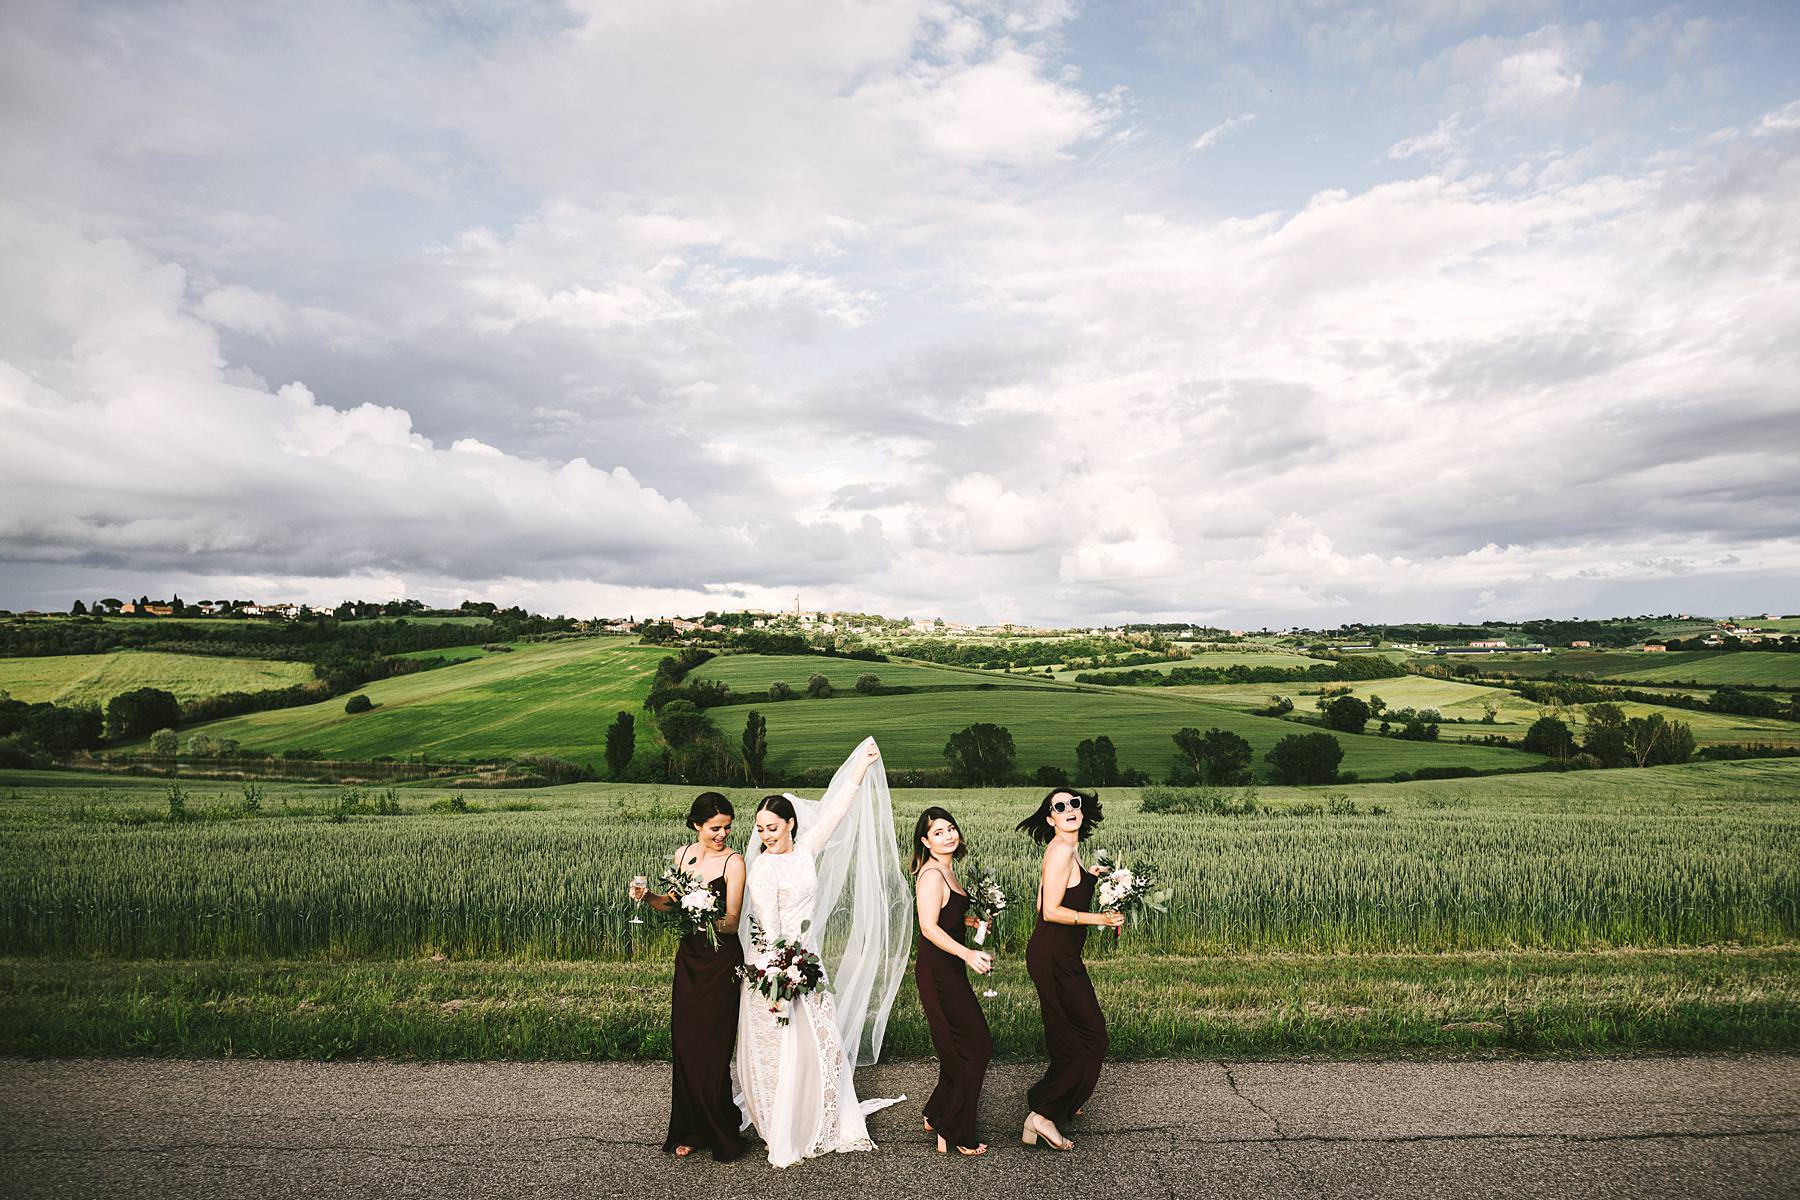 Gorgeous bride and bridesmaid wedding photo with amazing Umbria landscape countryside view near historic Villa l'Antica Posta venue